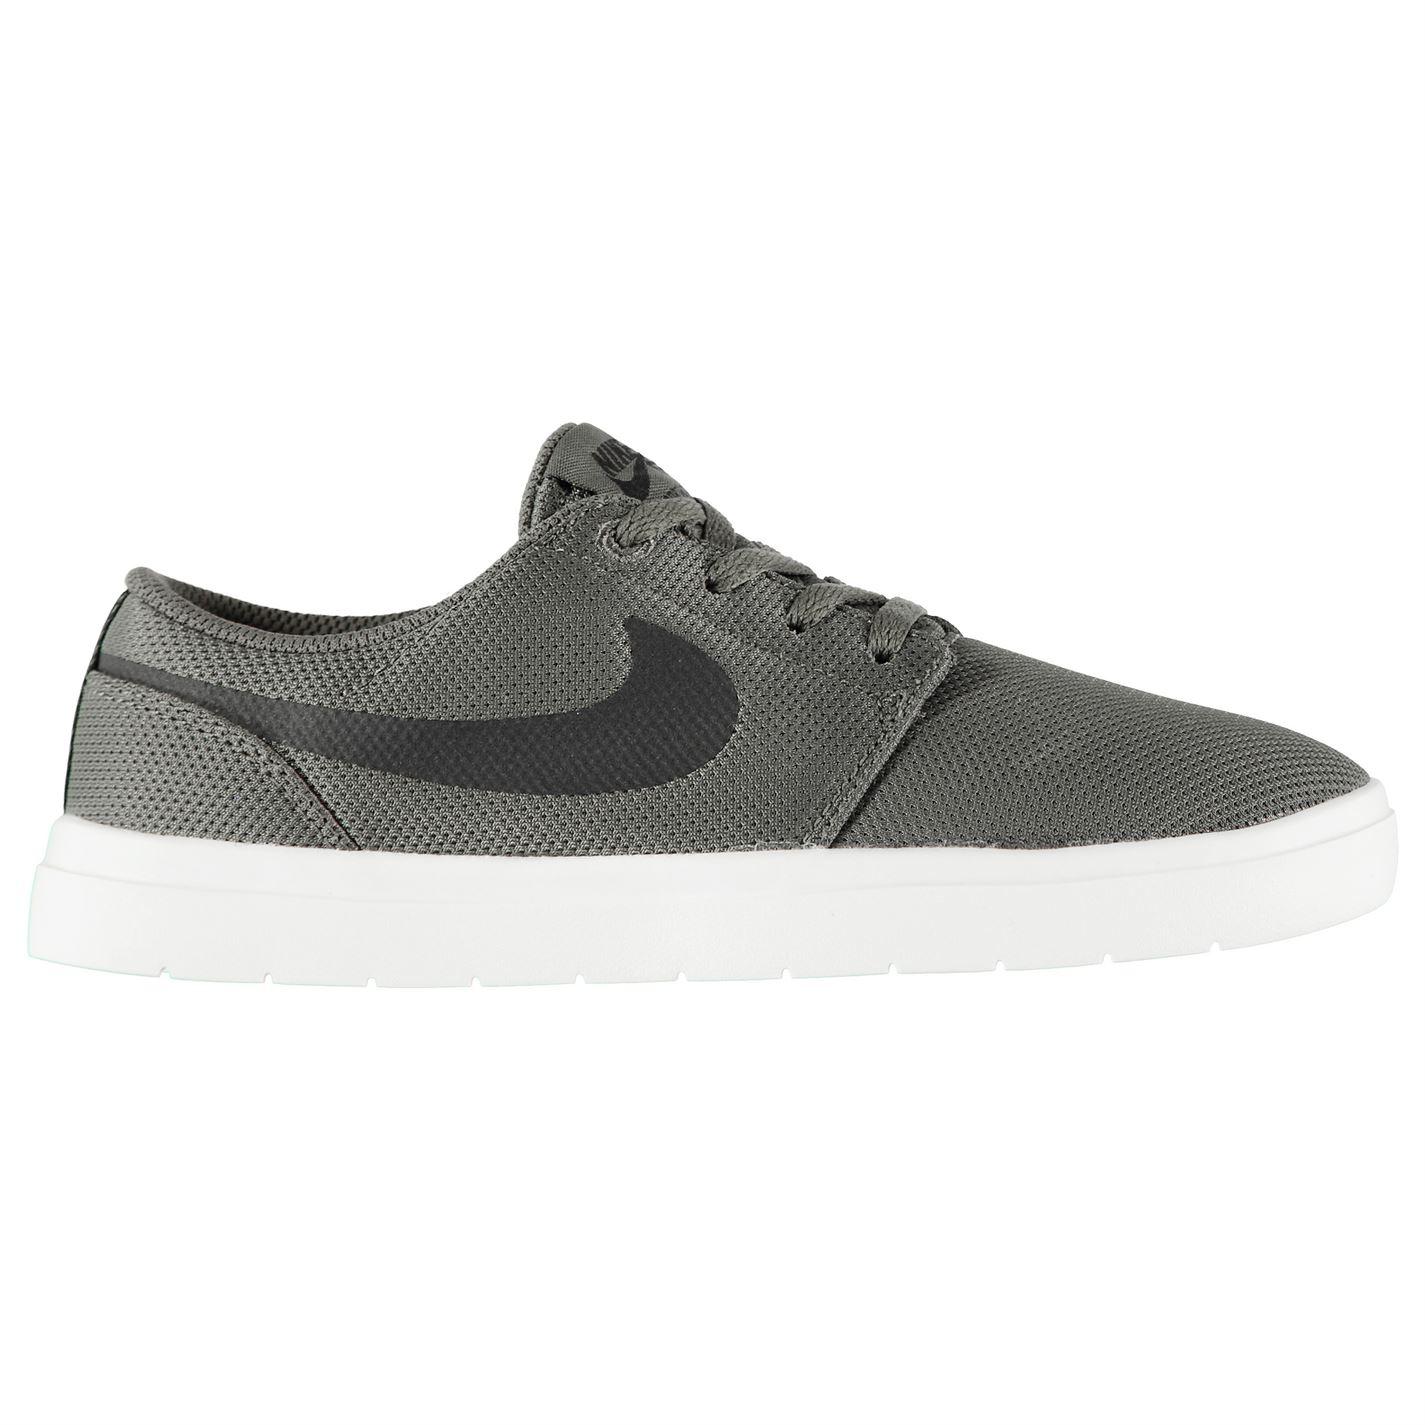 Nike SB Portmore Ultralight Chlapecké boty Skate tenisky - Glami.cz 480dcd35b0